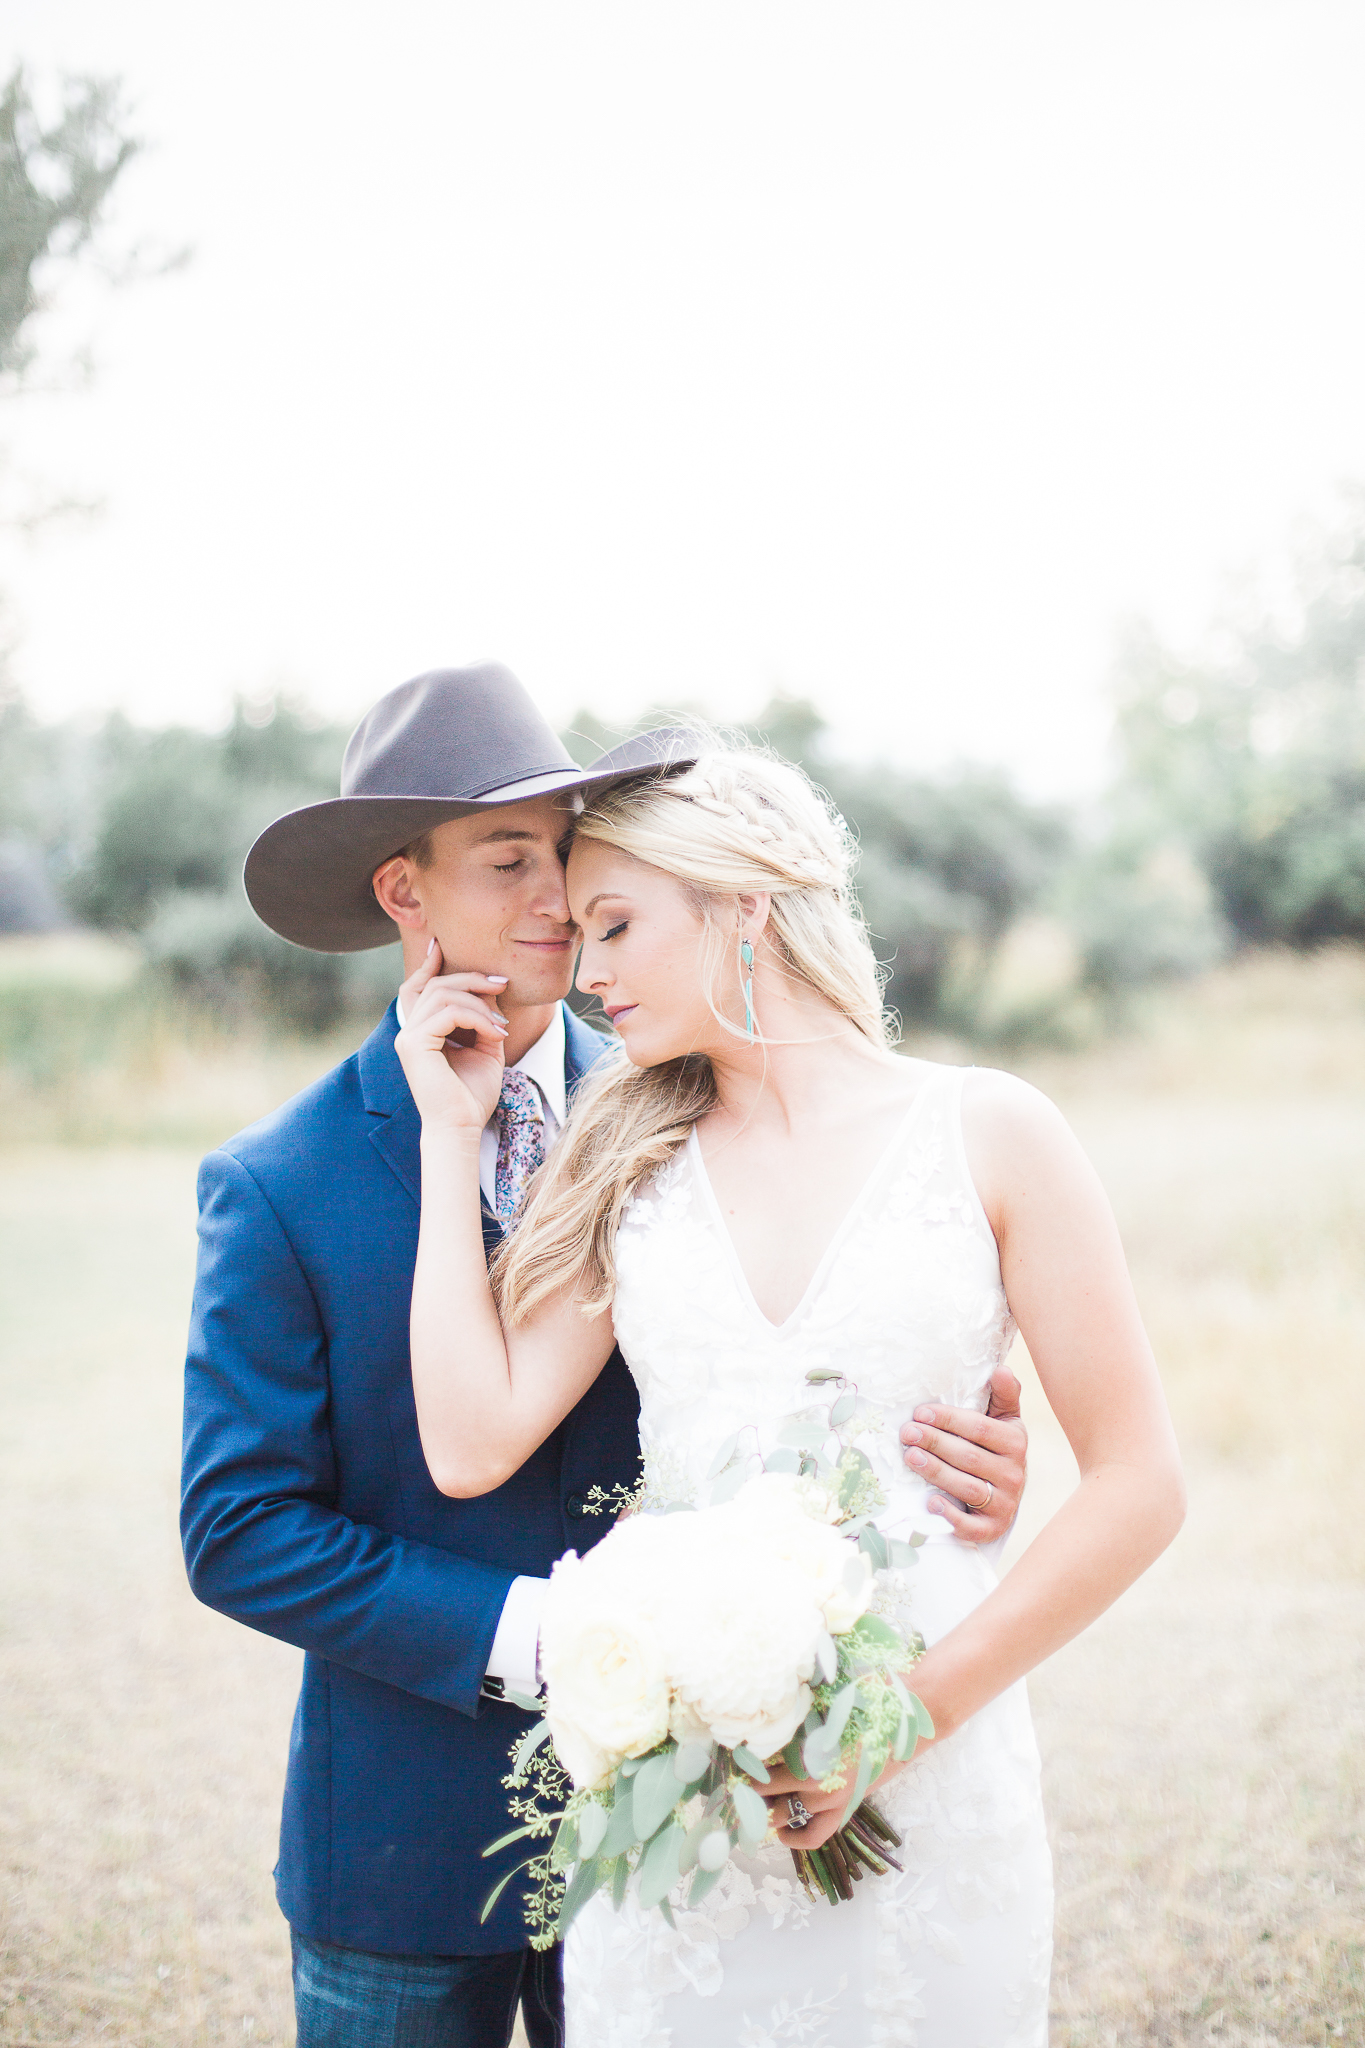 Laramie-Erik-Montana-Wedding-Highlight-BLOG-105